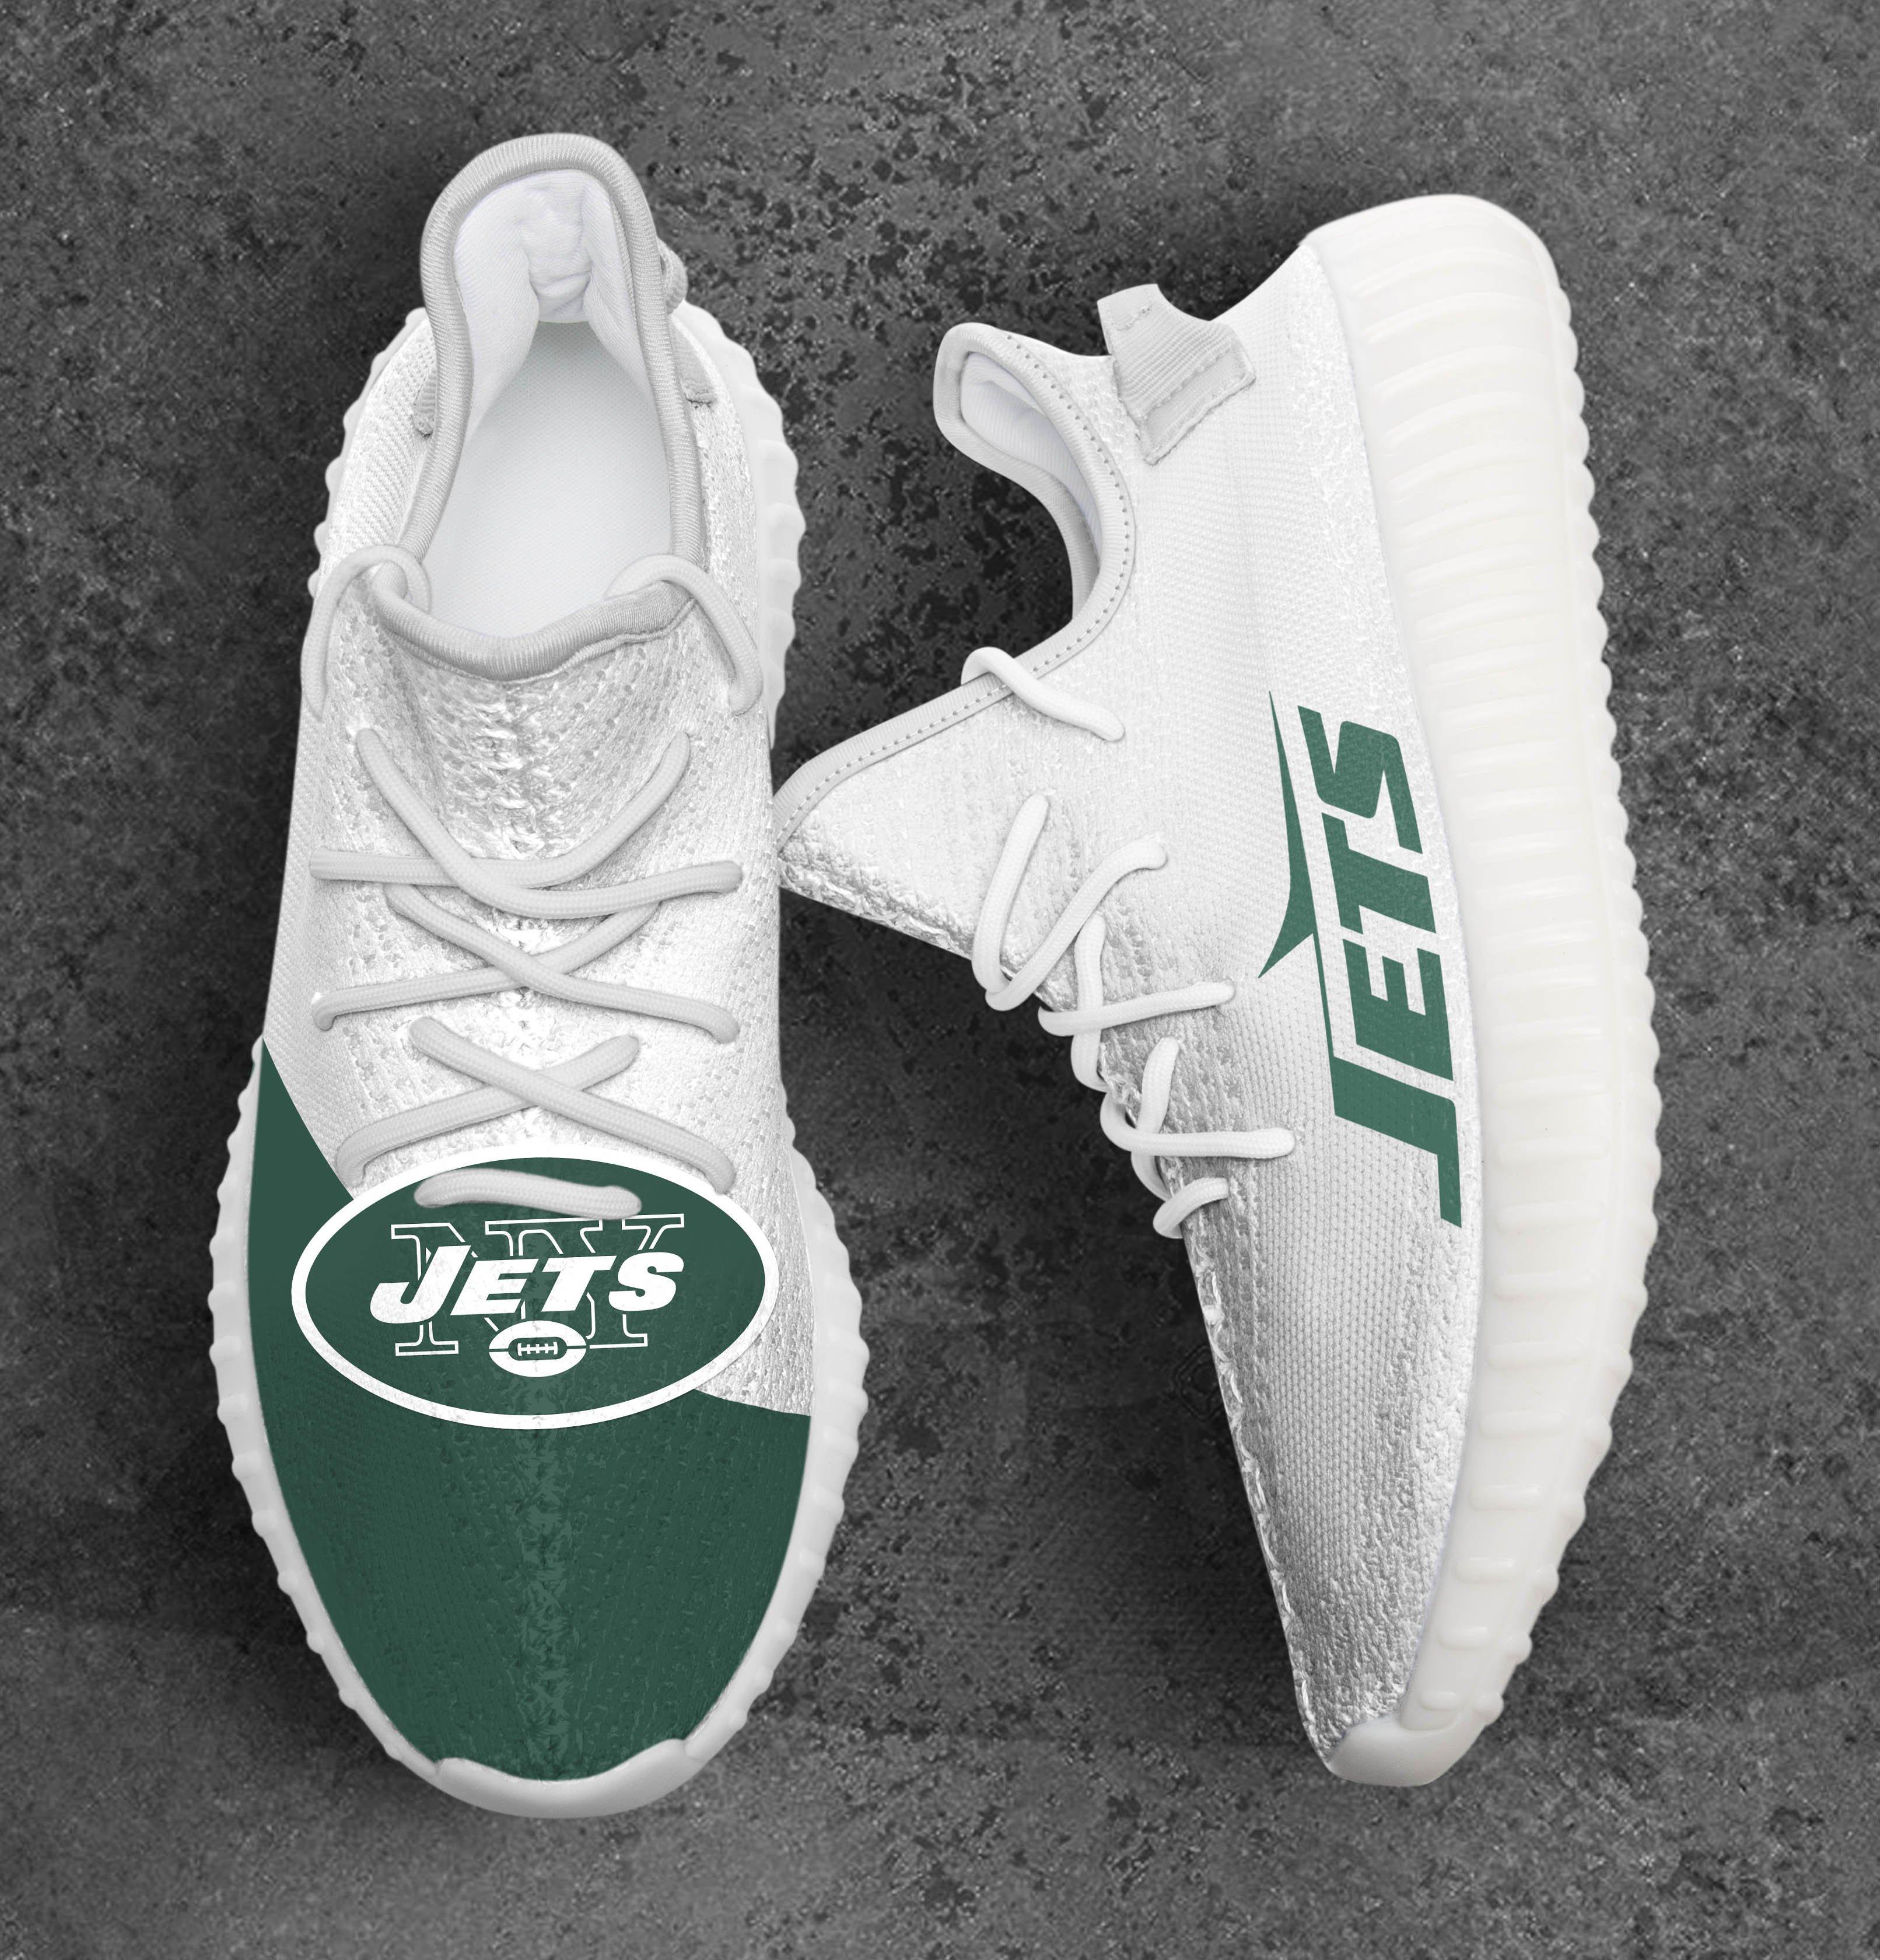 New York Jets NFL Sport Teams Adidas Yeezy Boost 350 V2 Top Branding Trends